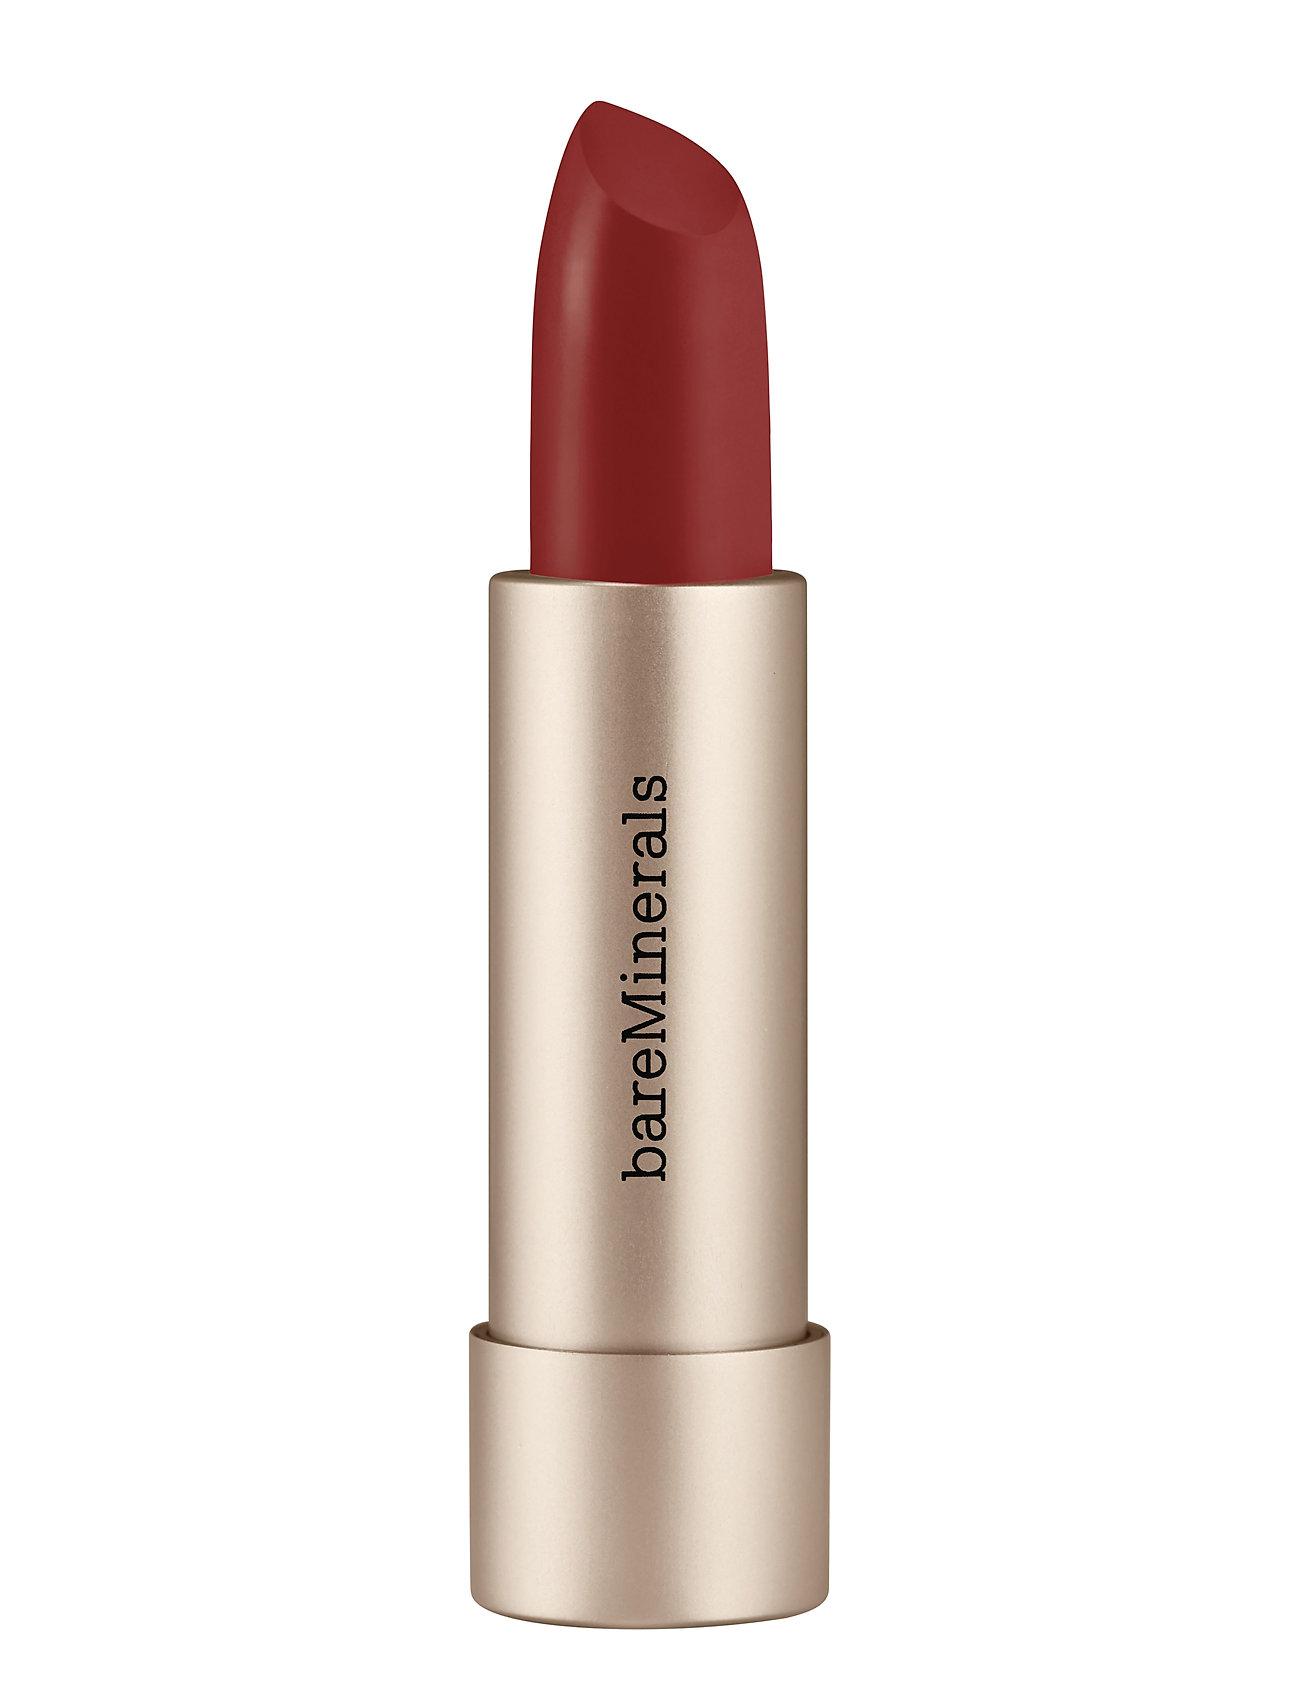 Image of Mineralist Hydra-Smoothing Lipstick Awareness Læbestift Makeup BareMinerals (3418623907)